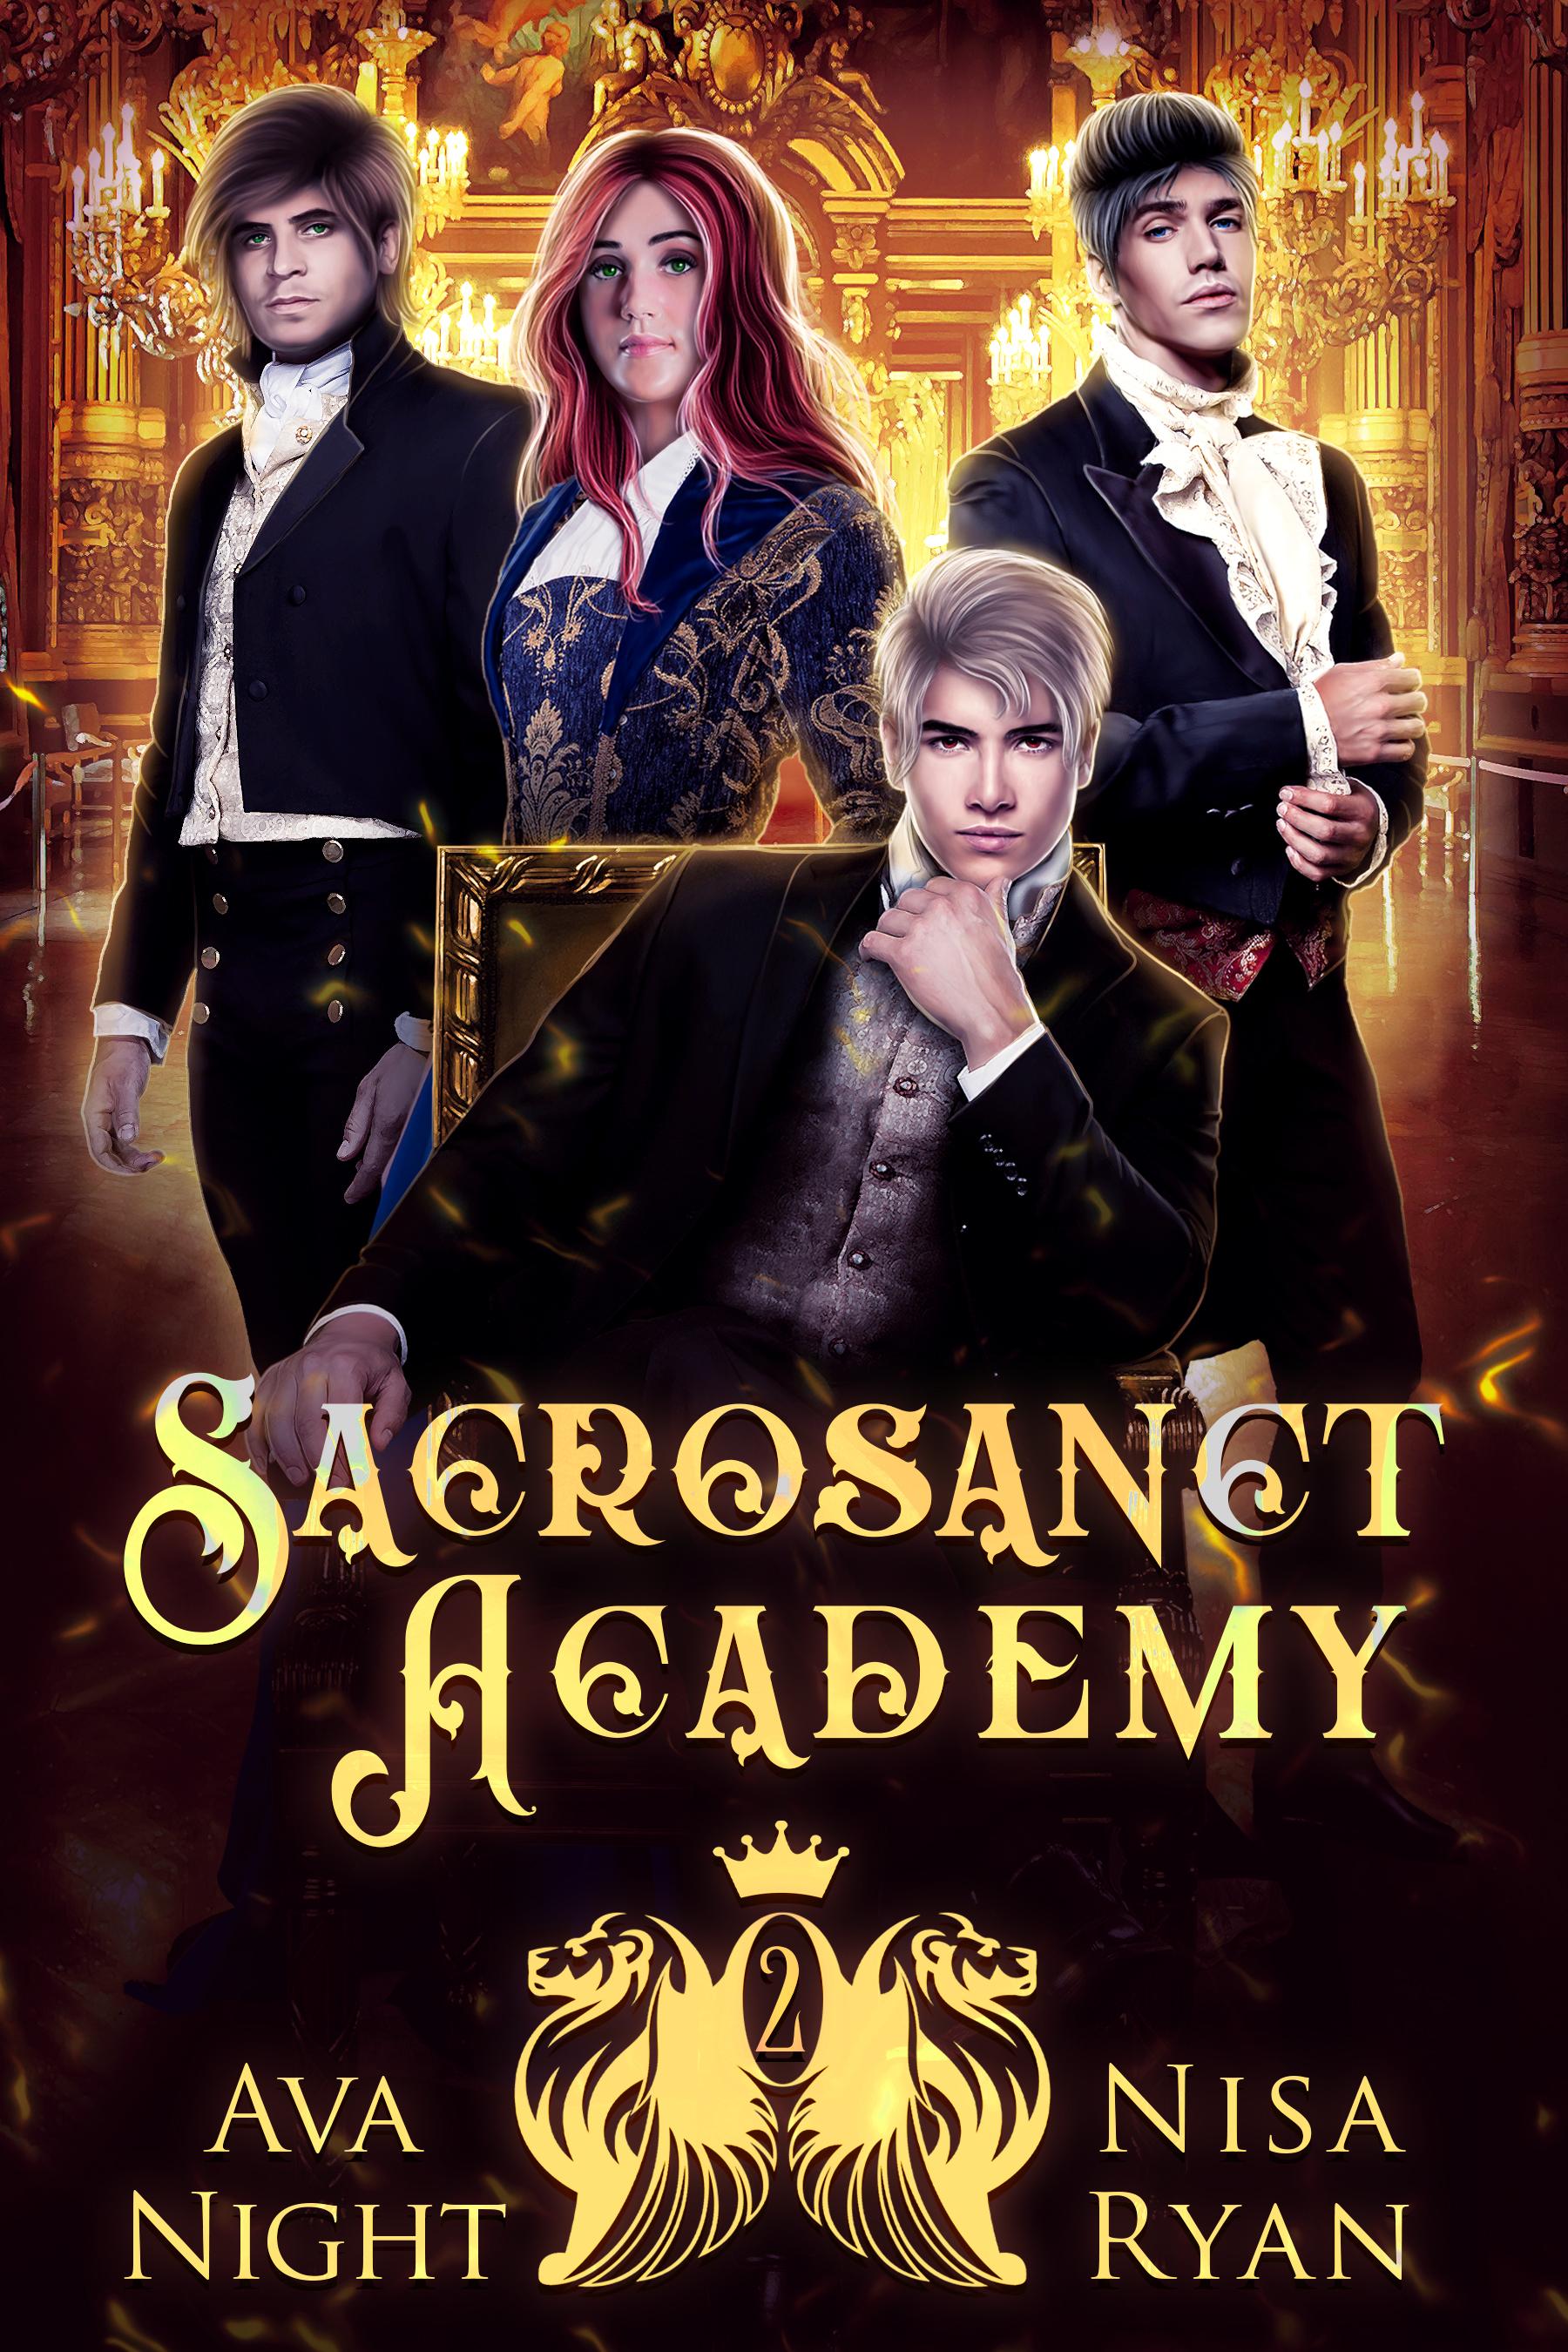 Sacrosanct Academy2